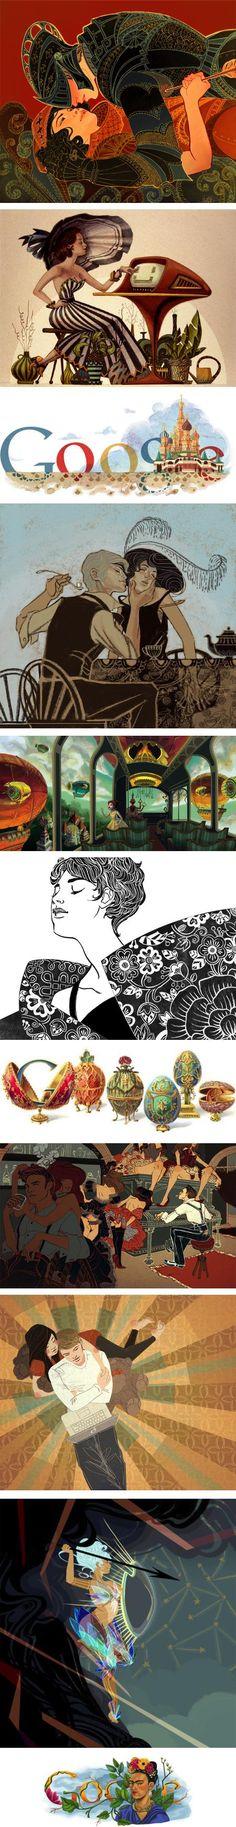 Jennifer Hom, google doodles and personal work